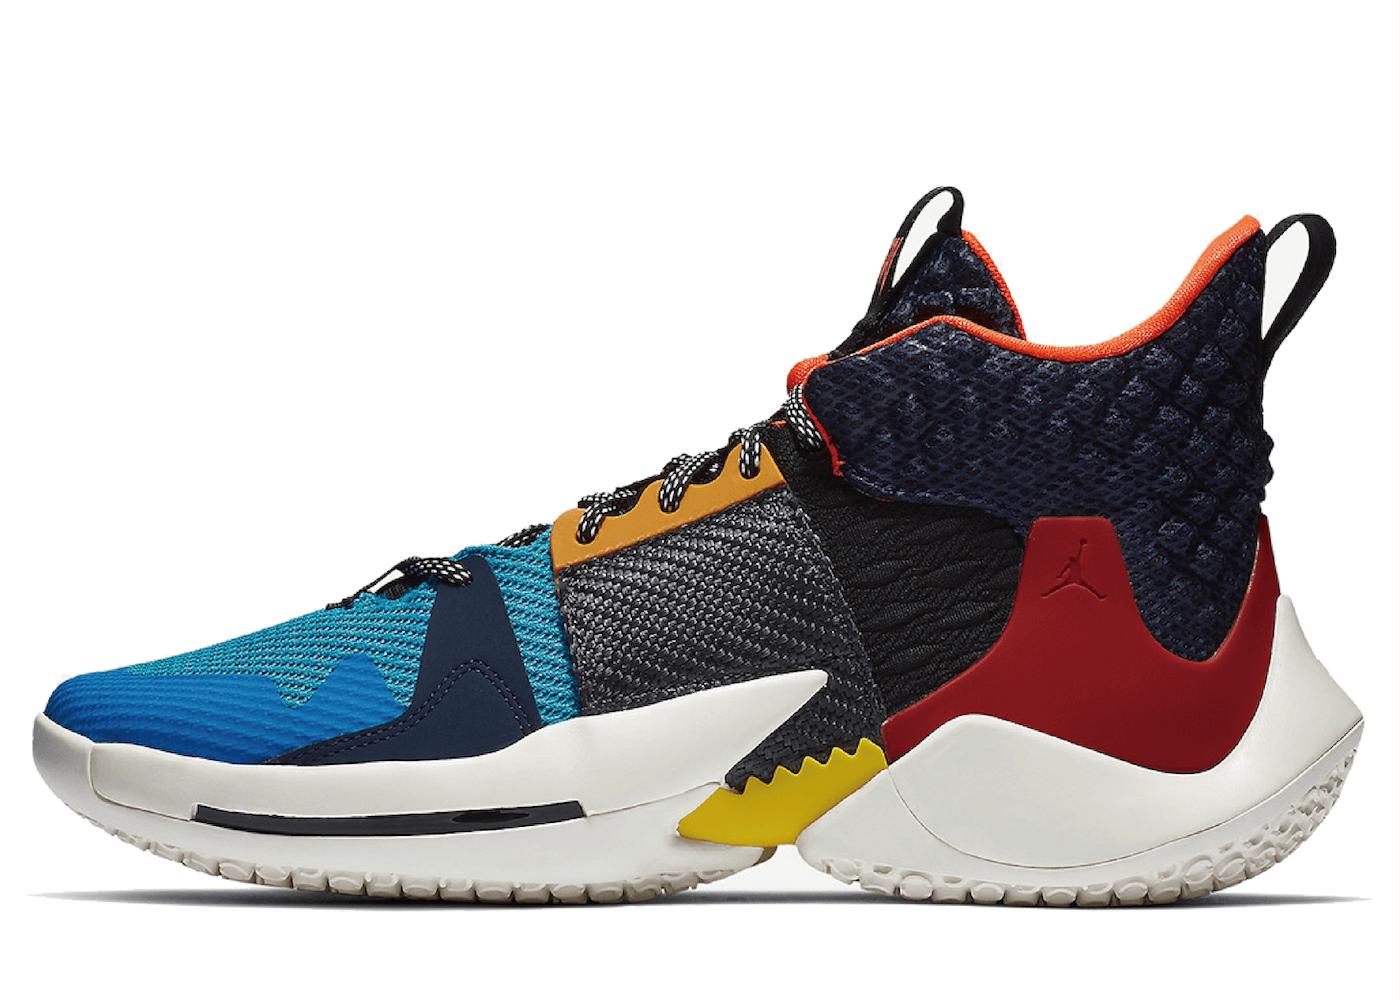 Nike Air Jordan Why Not Zer0.2の写真